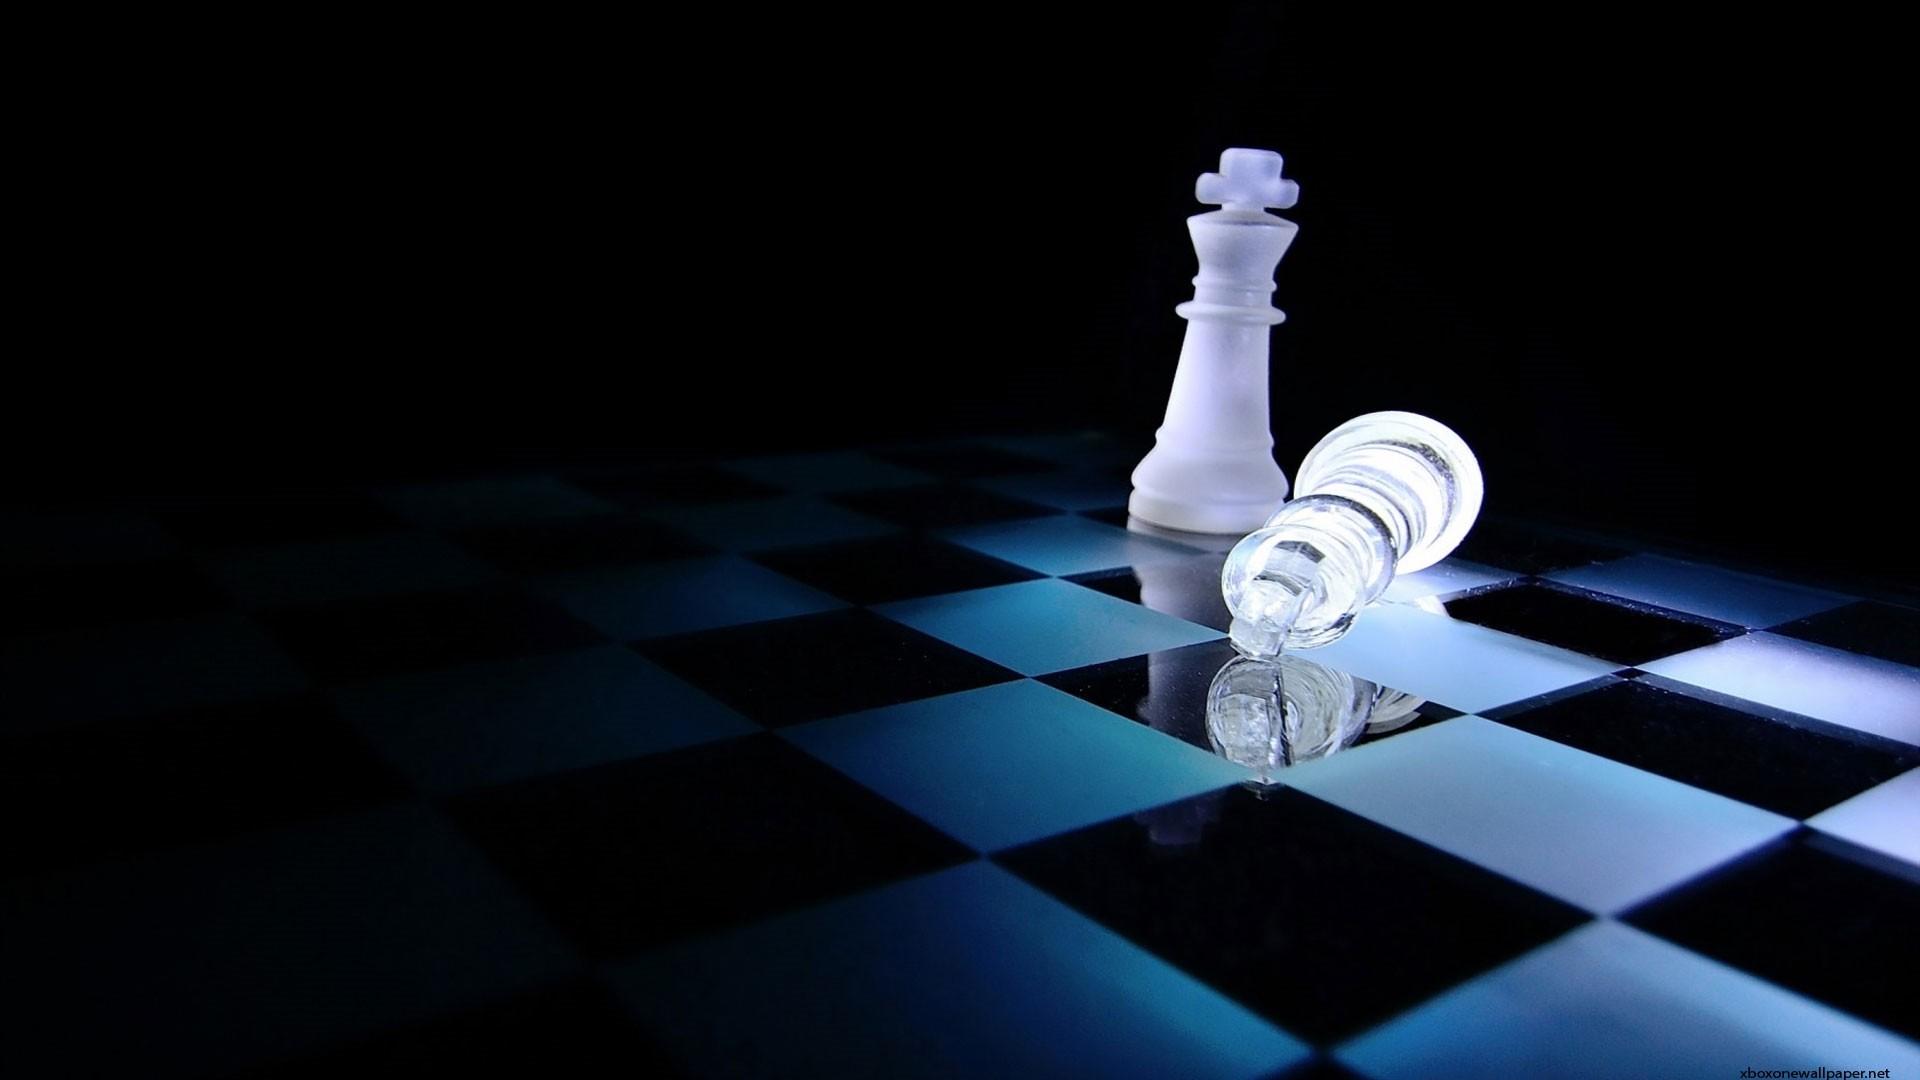 Chess High Quality